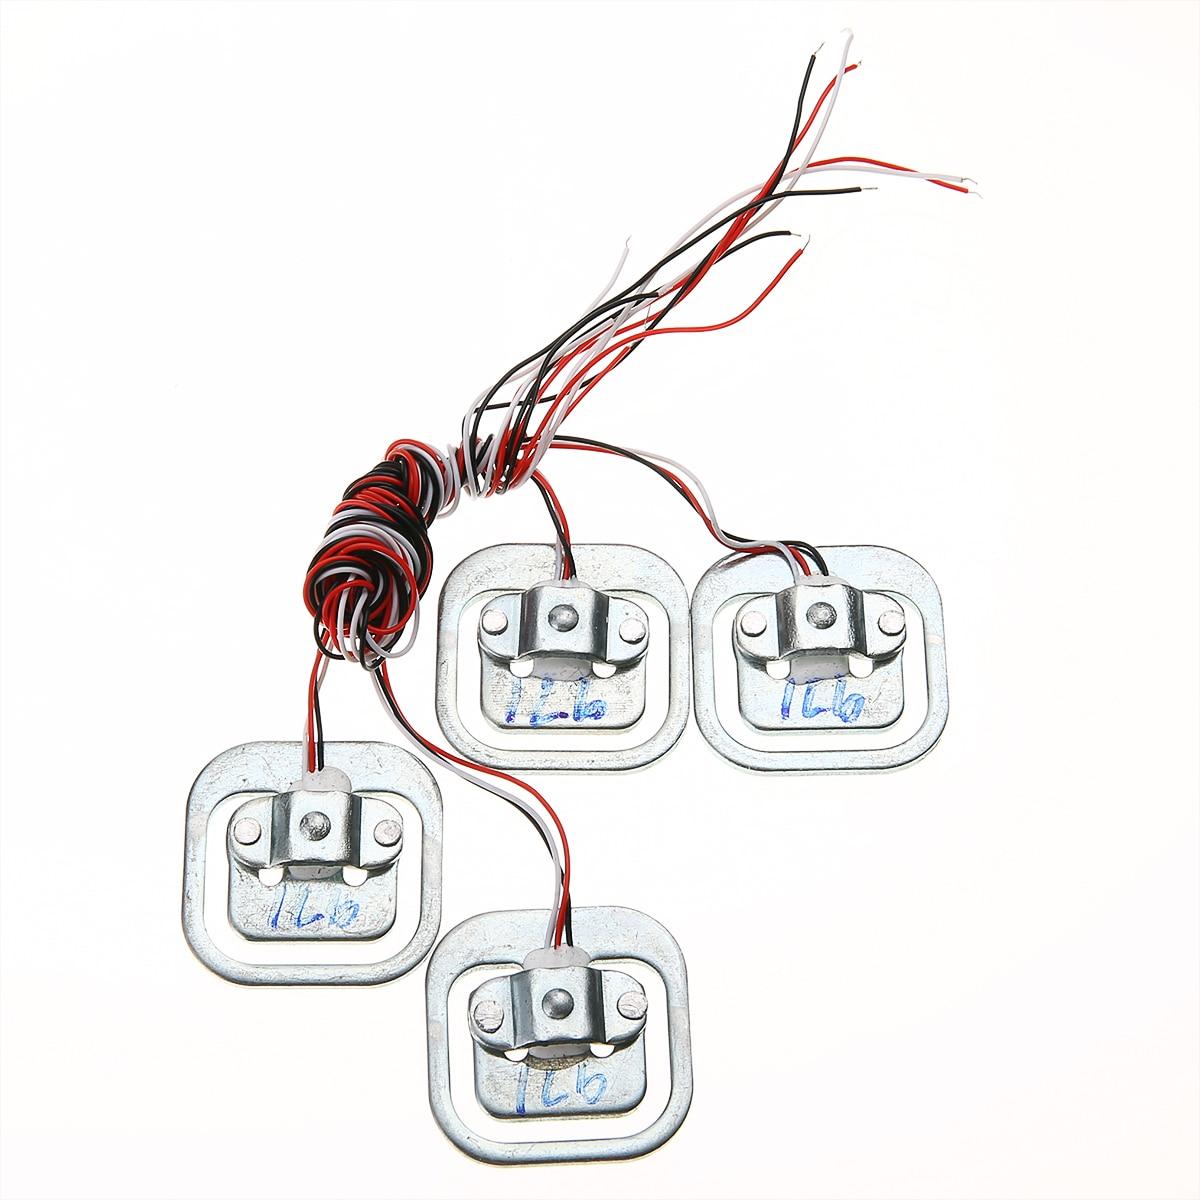 4pcs New Body Load Cell Weighing Sensor Resistance Strain Half-bridge Sensor 50kg